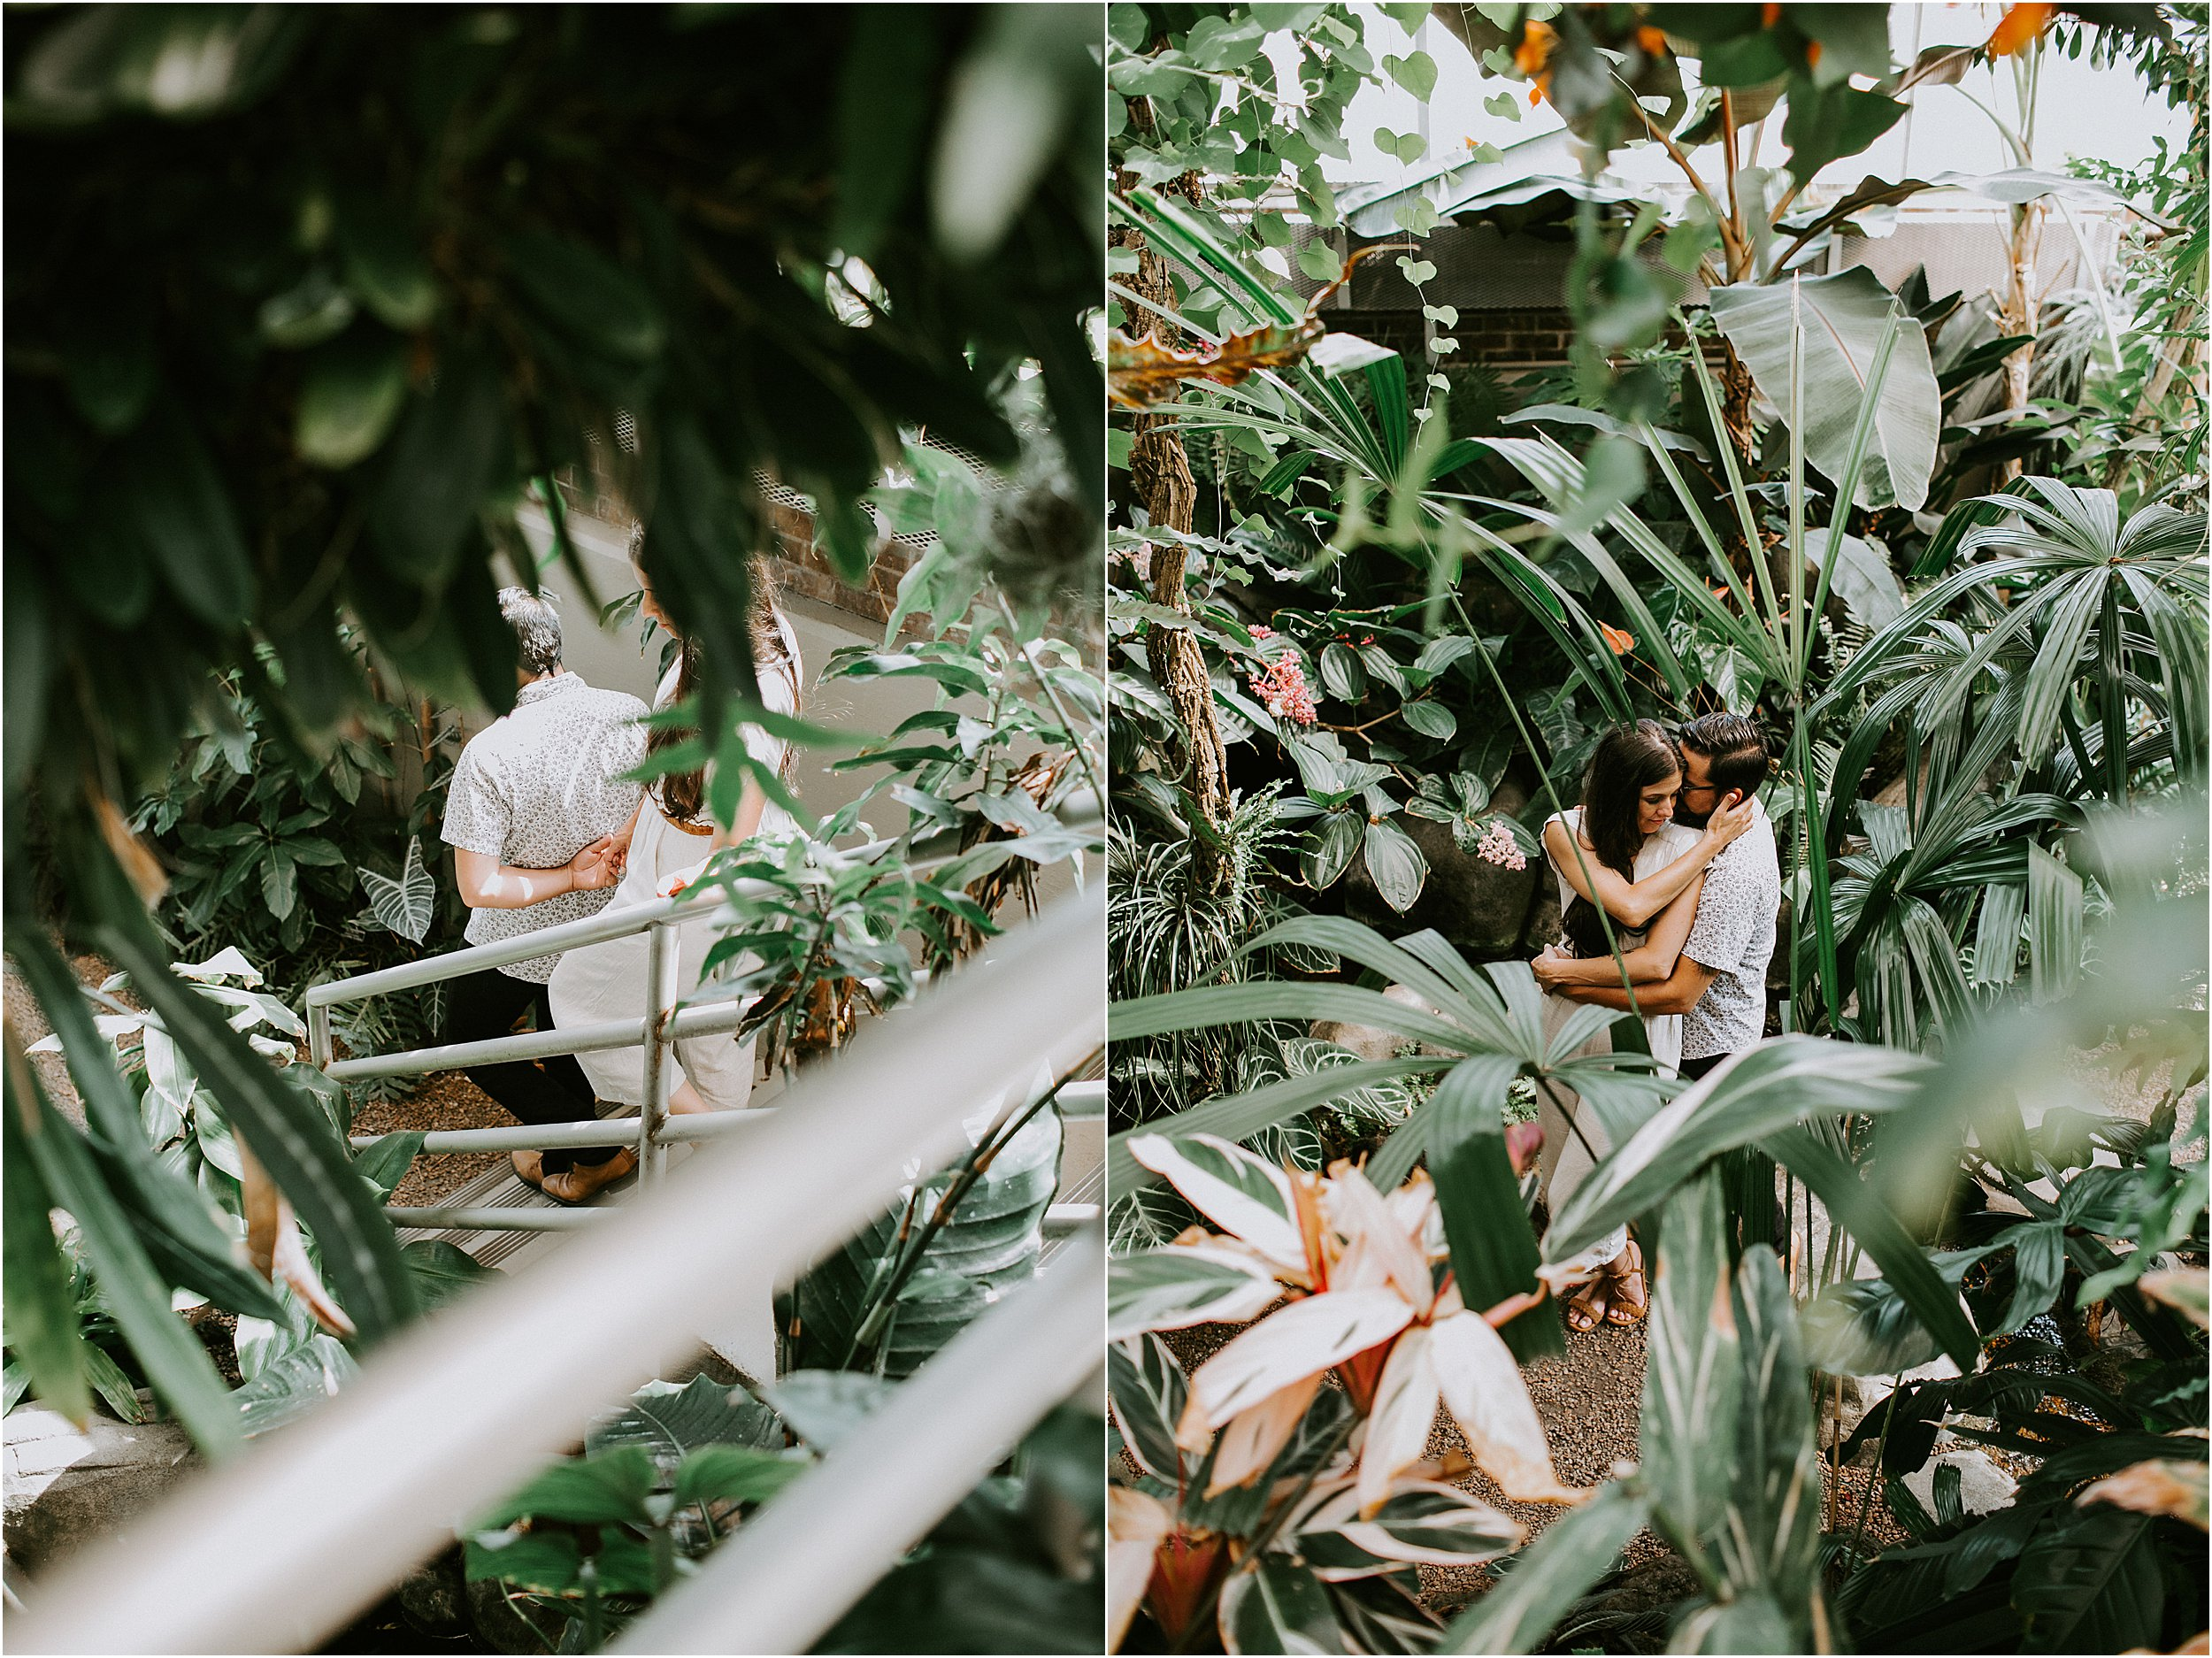 Greenhouse-Adventure-Session_022.jpg